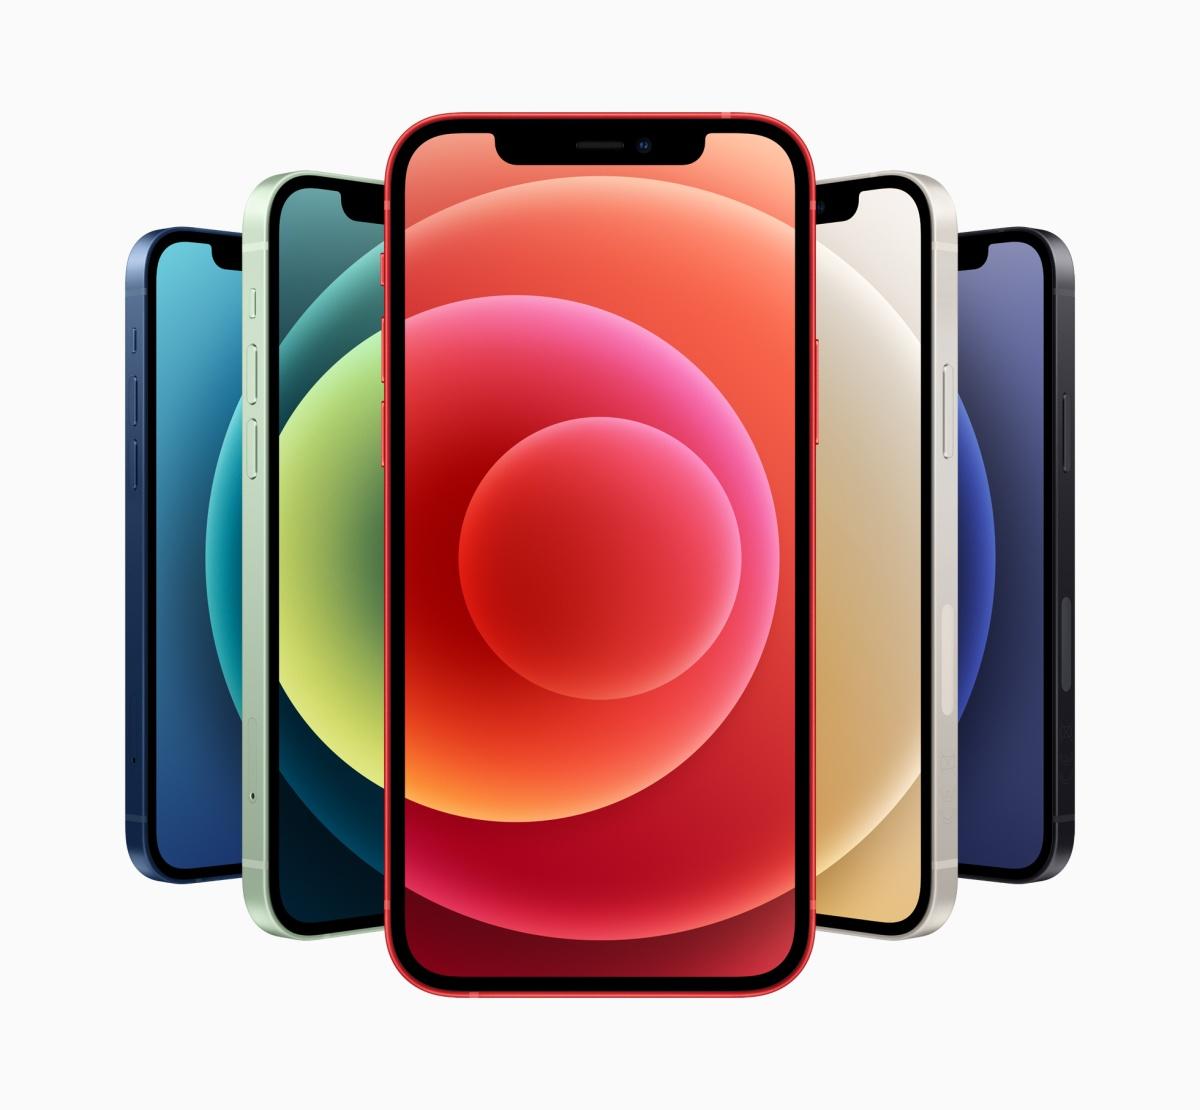 Apple reveals four newiPhones